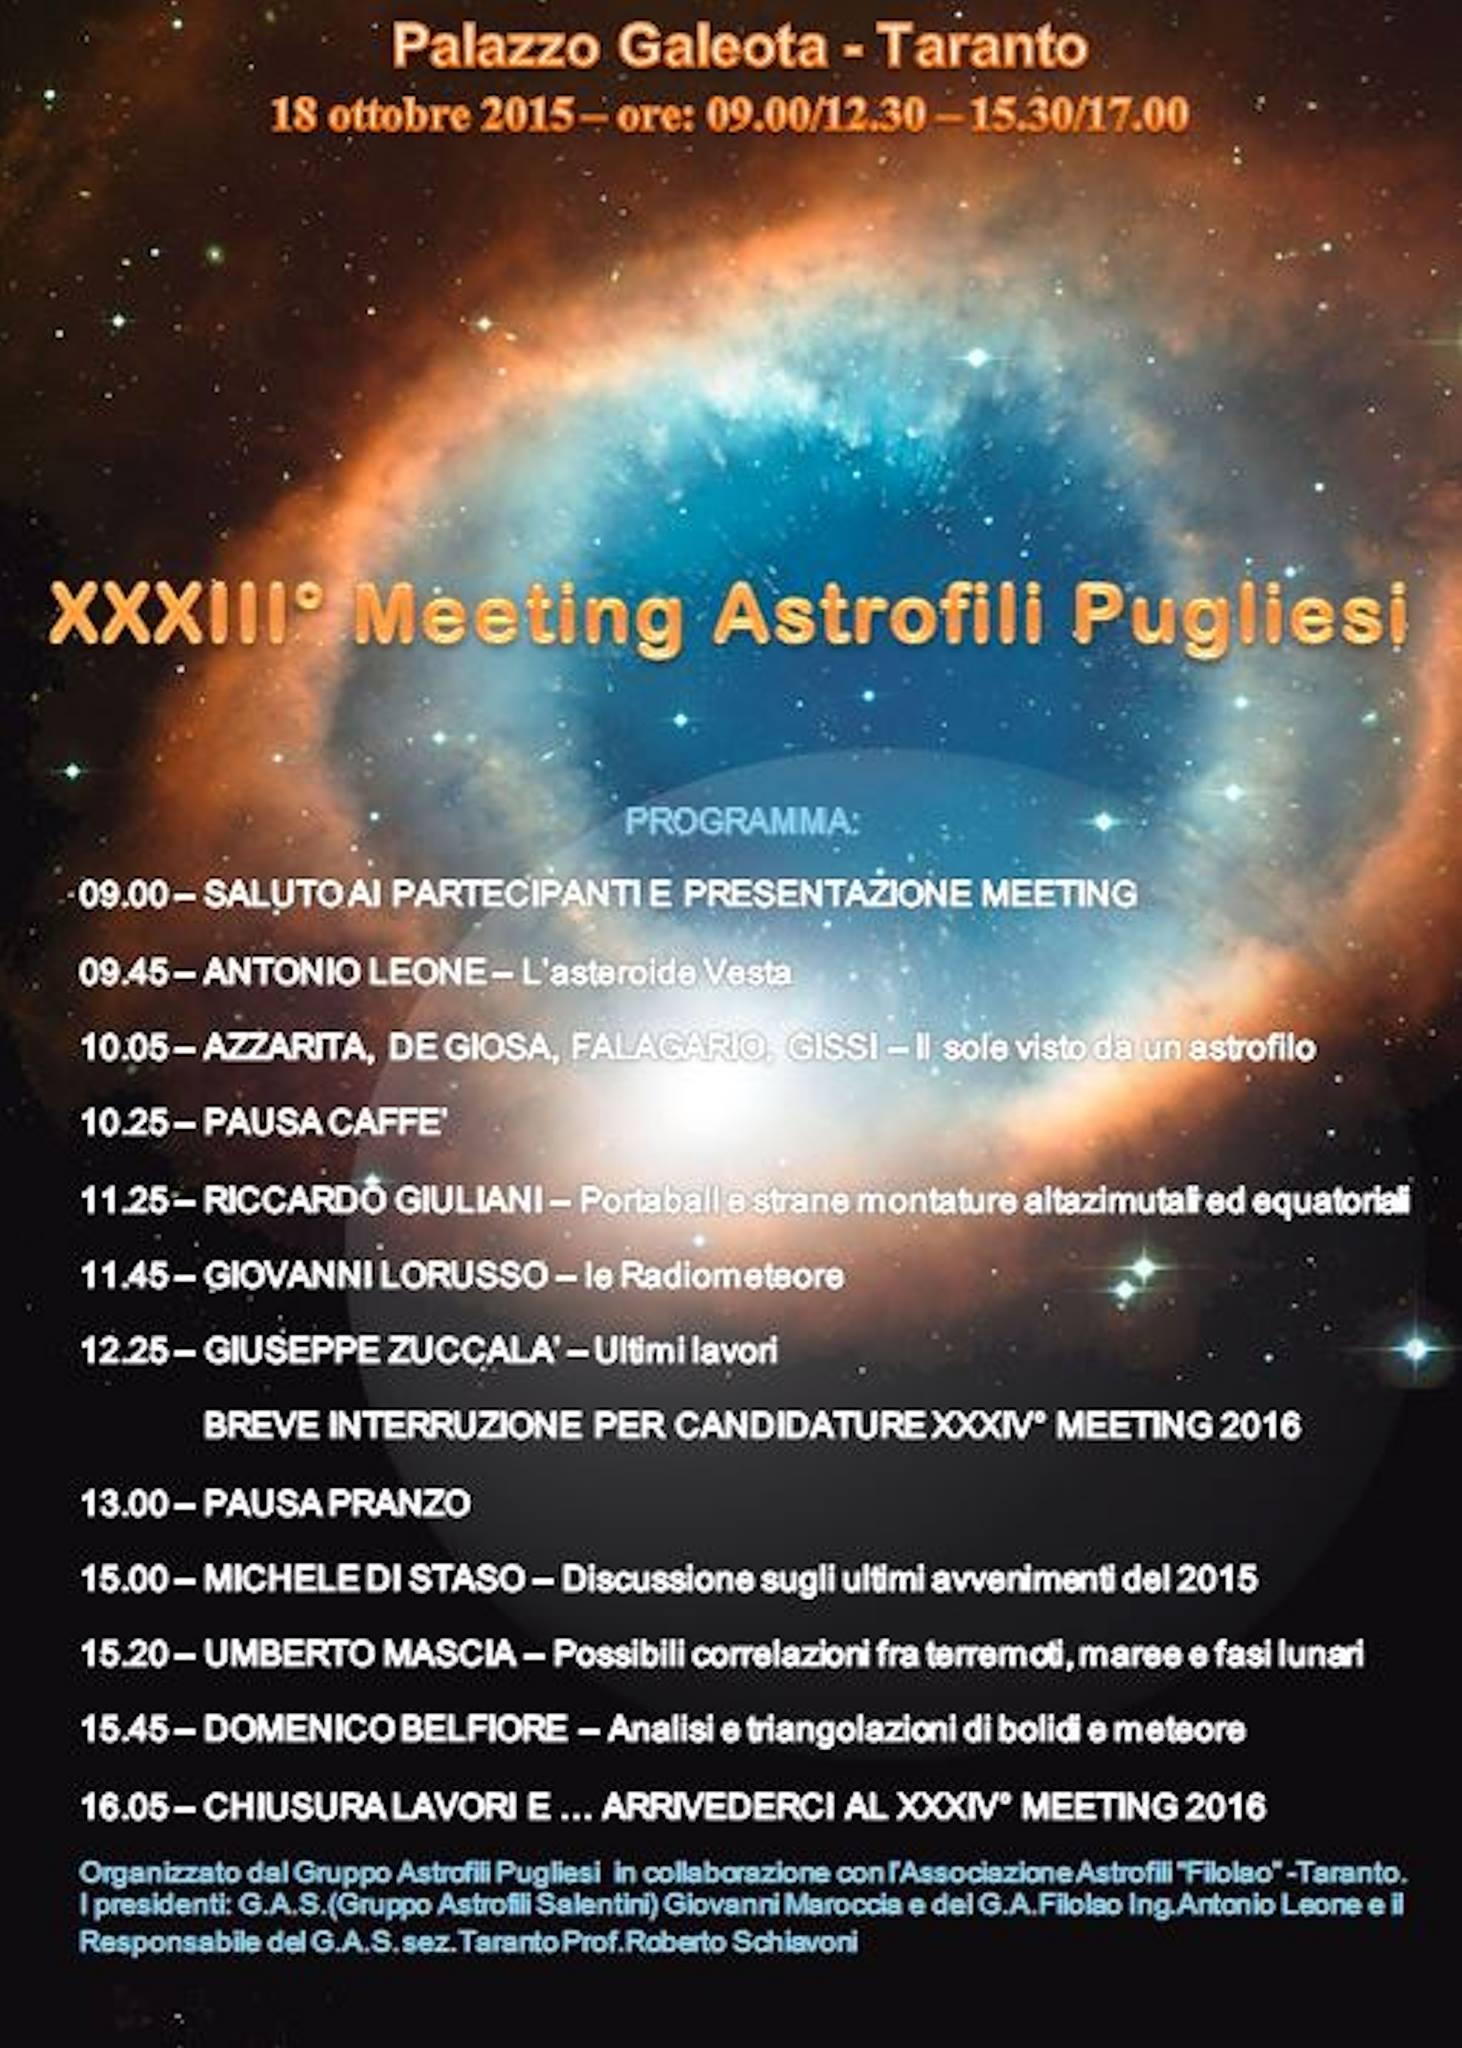 XXXIII° Meeting Astrofili Pugliesi